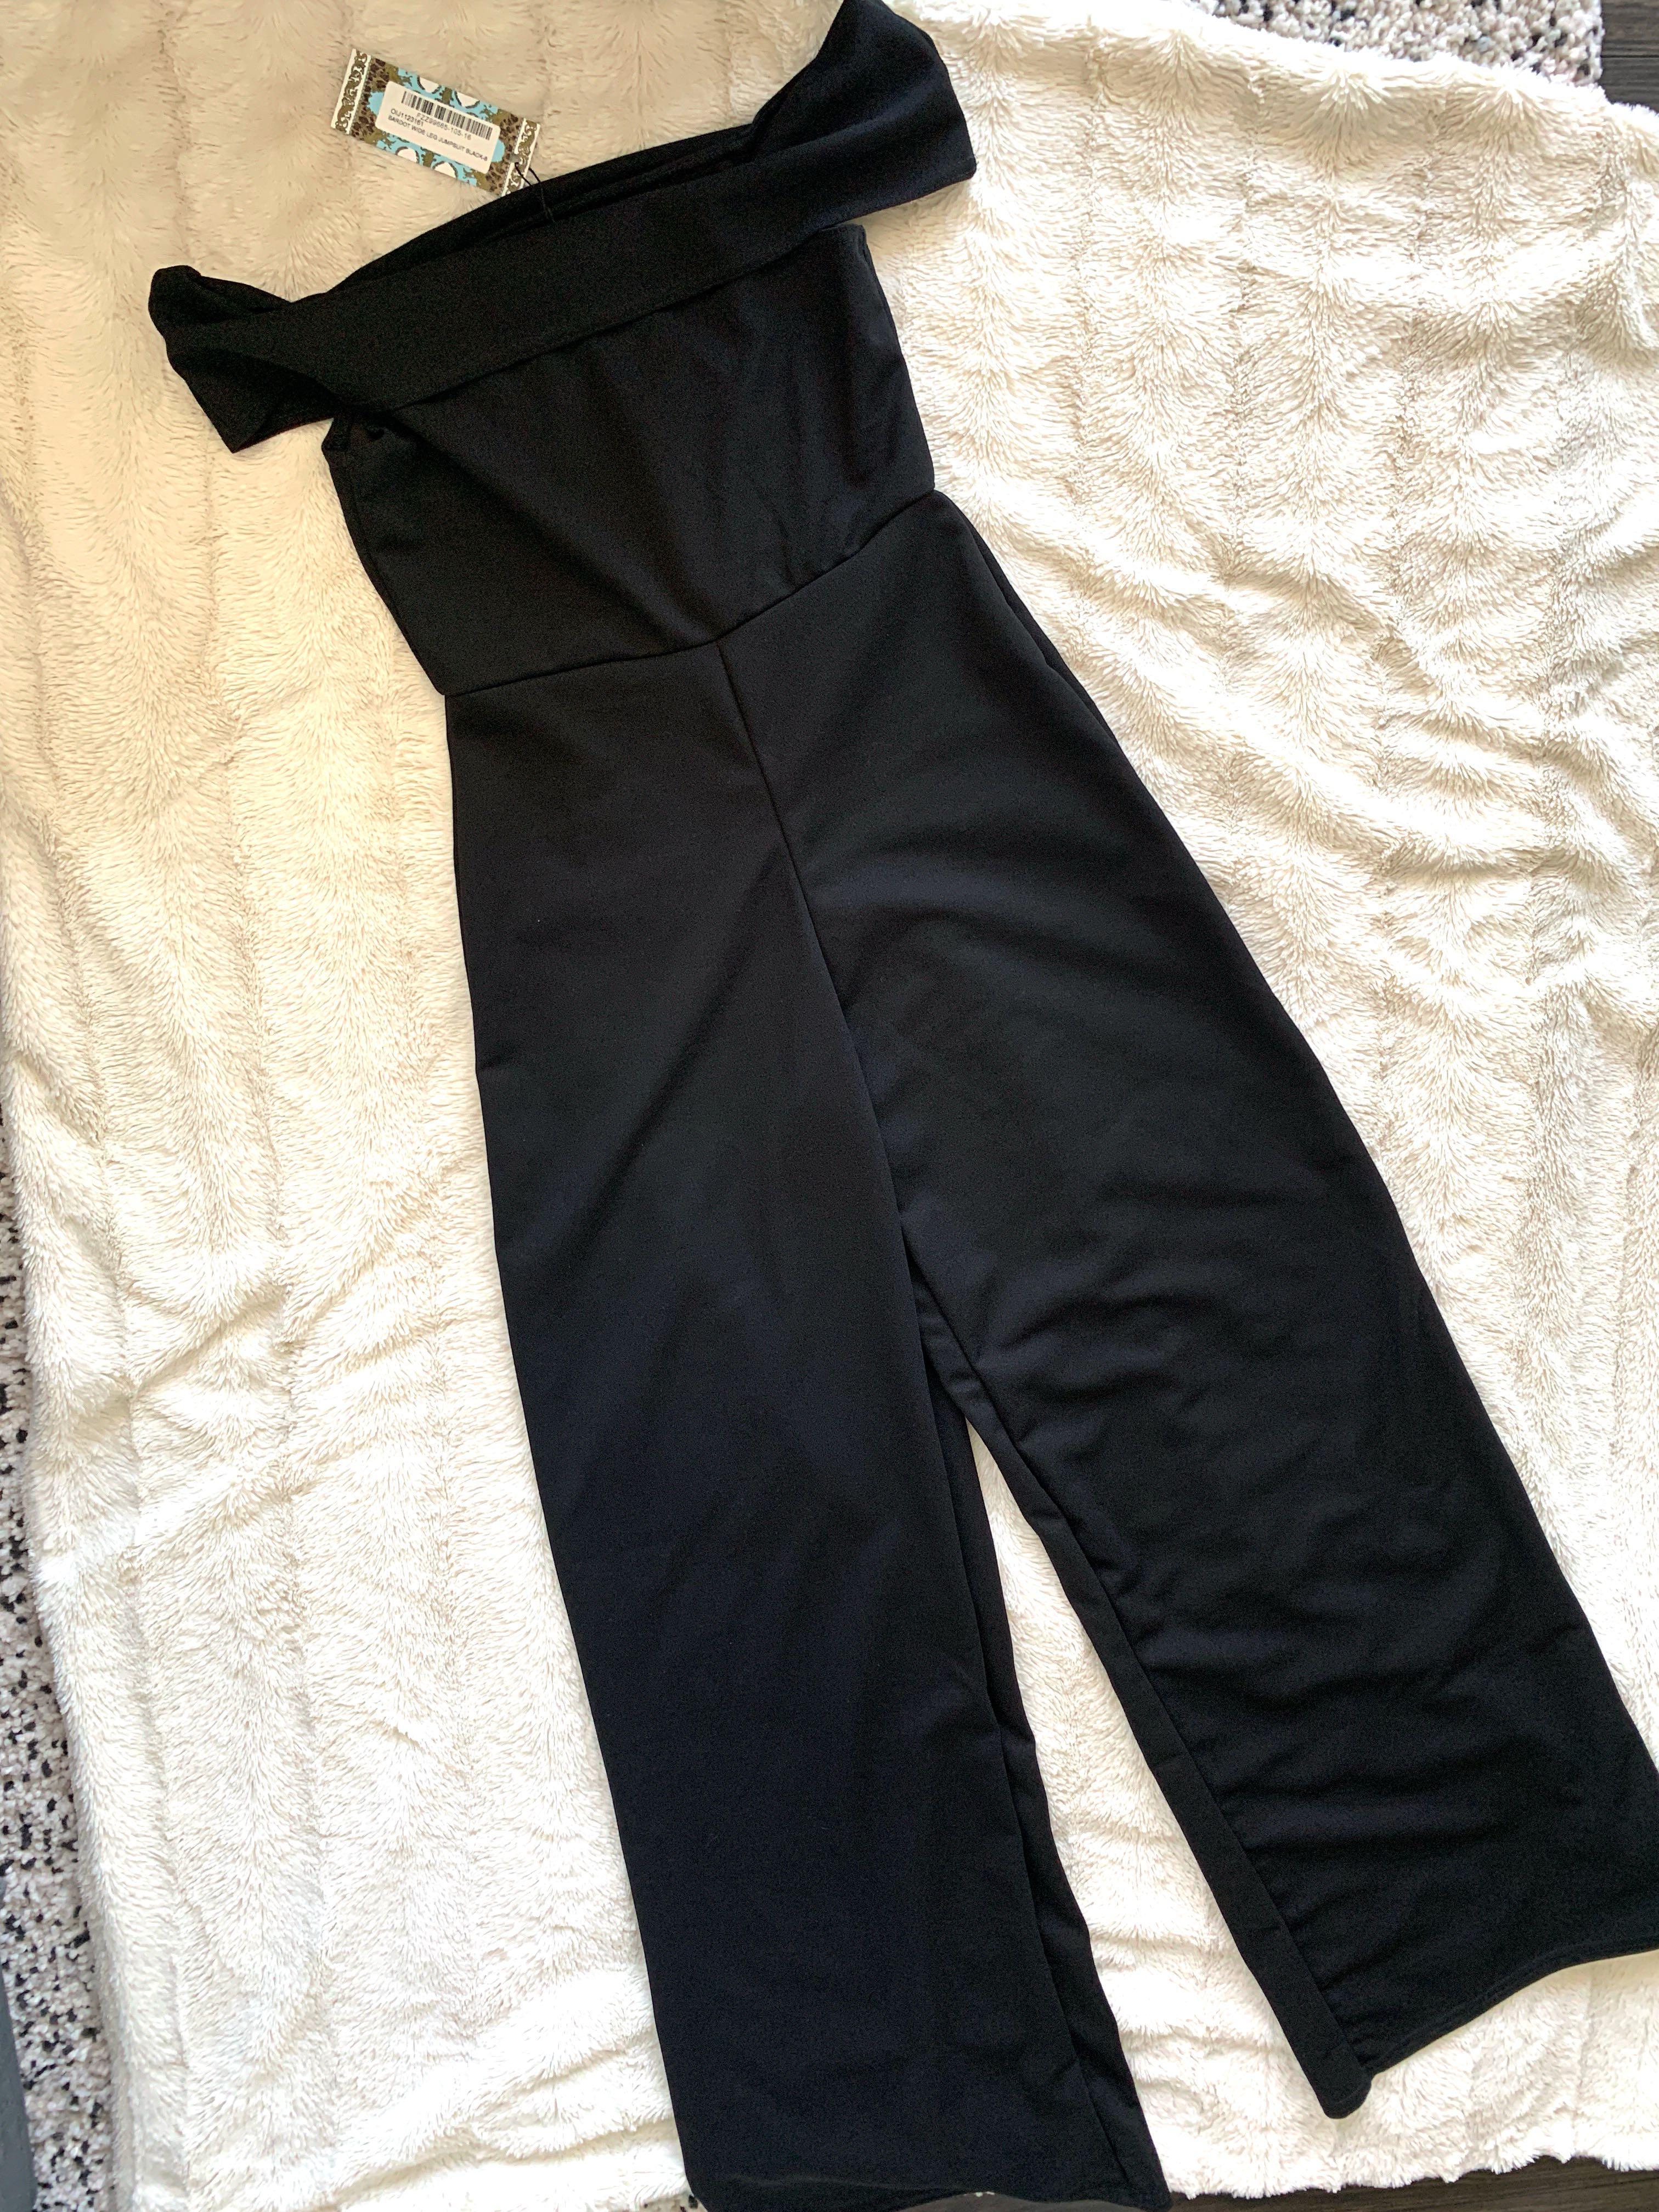 Bardot Style Jumpsuit